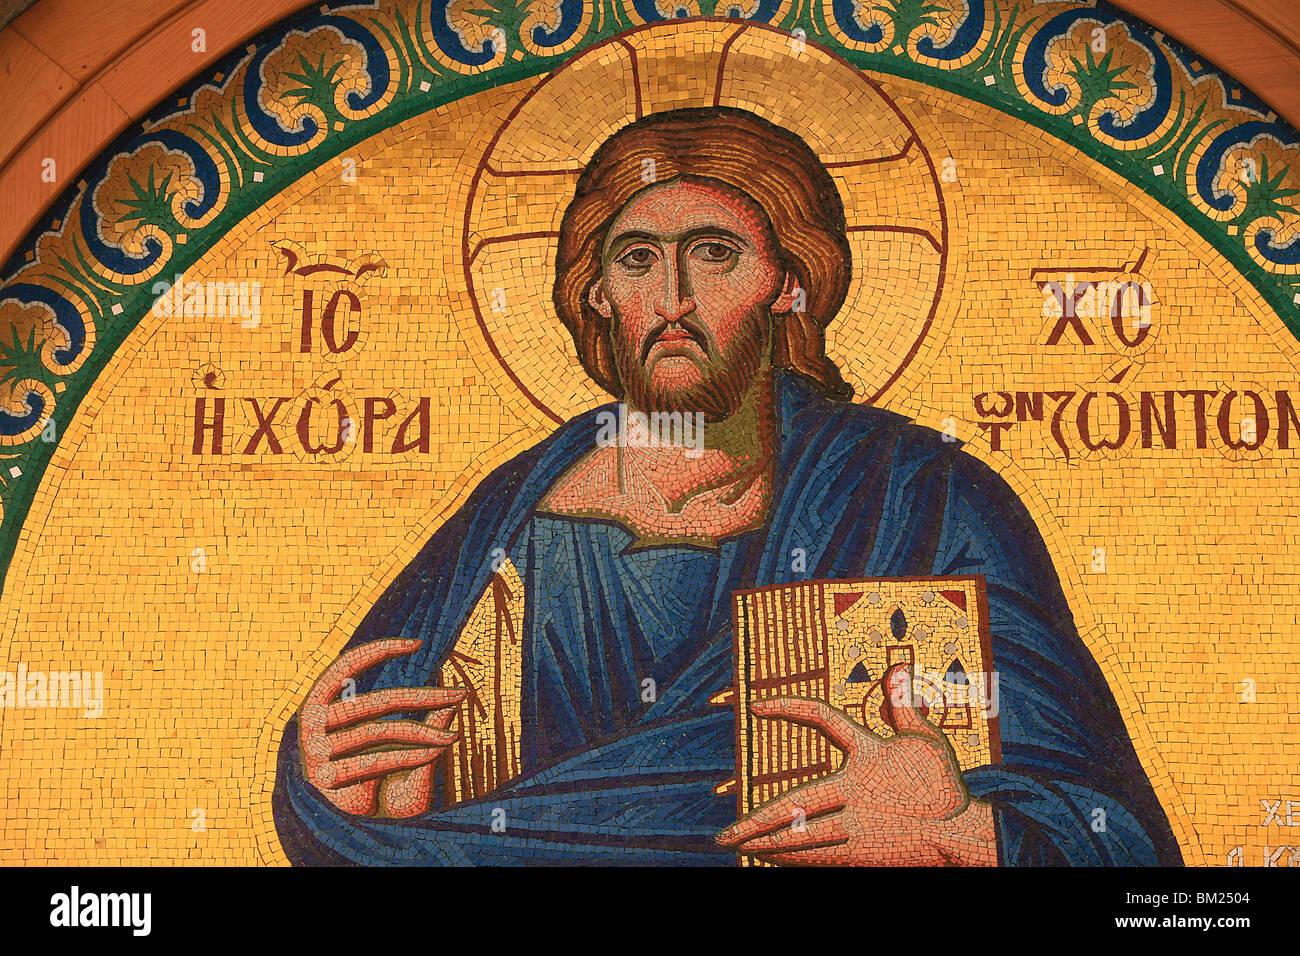 Greek Orthodox icon depicting Jesus Christ, Thessalonica, Macedonia, Greece, Europe - Stock Image